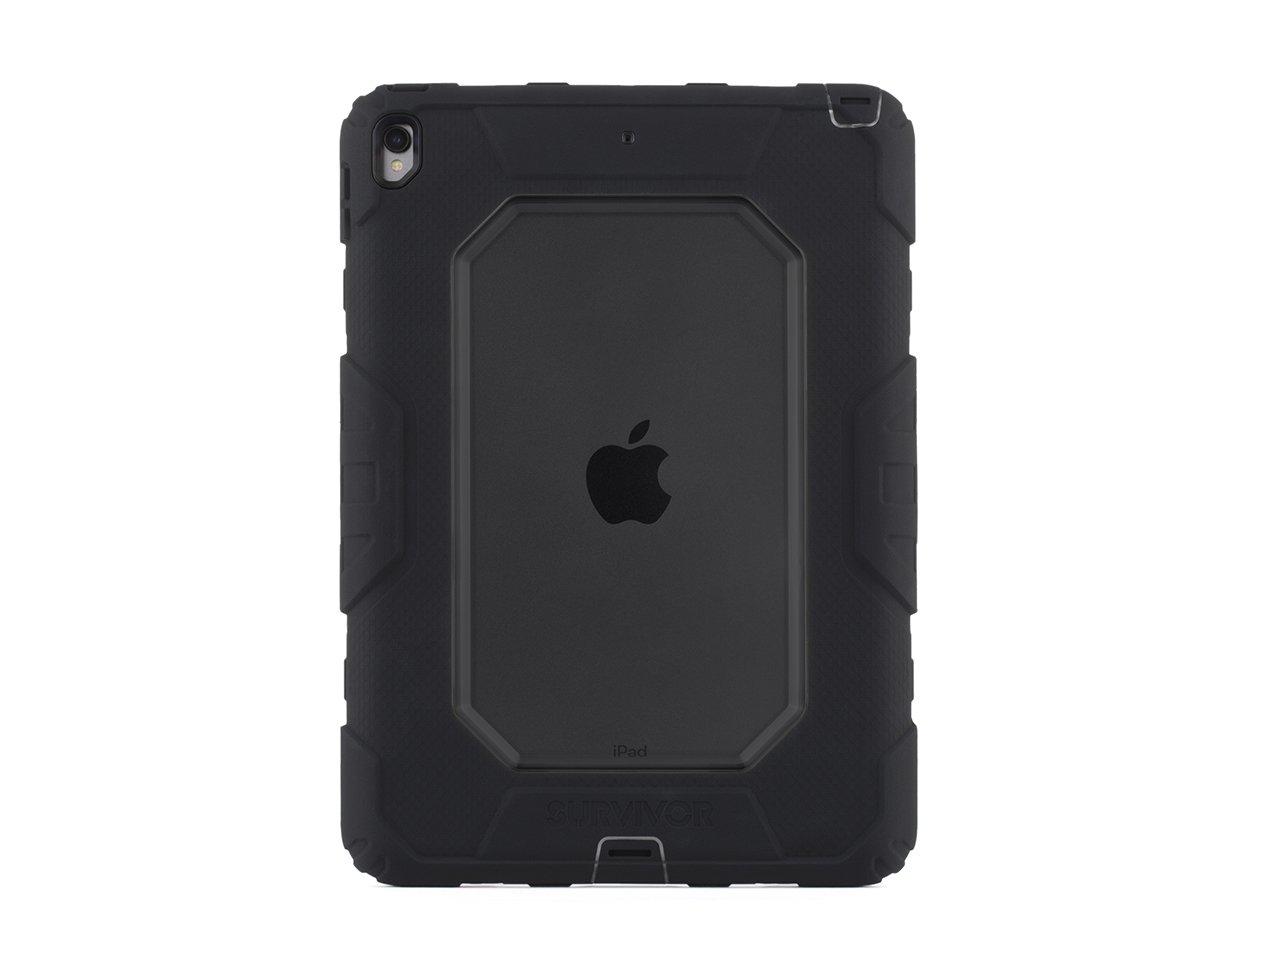 Griffin Survivor All Terrain Case for iPad Pro 10.5 Black (GB43427) Cesium Telecom CA